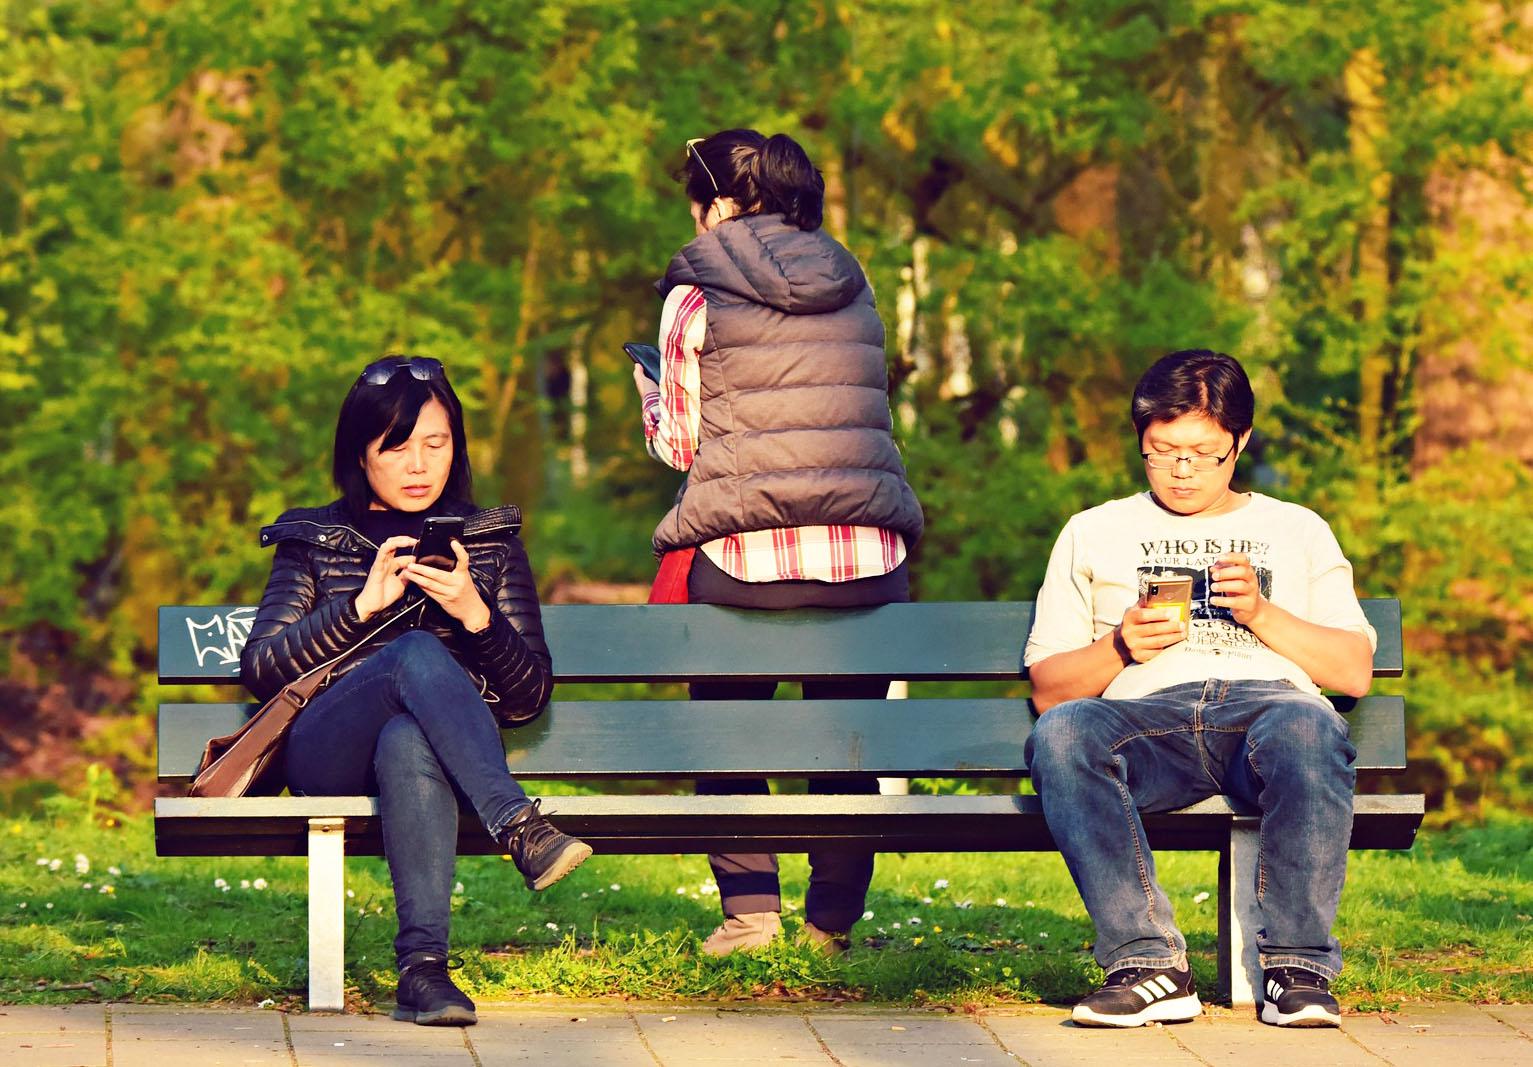 people using smartphone on bench.jpg